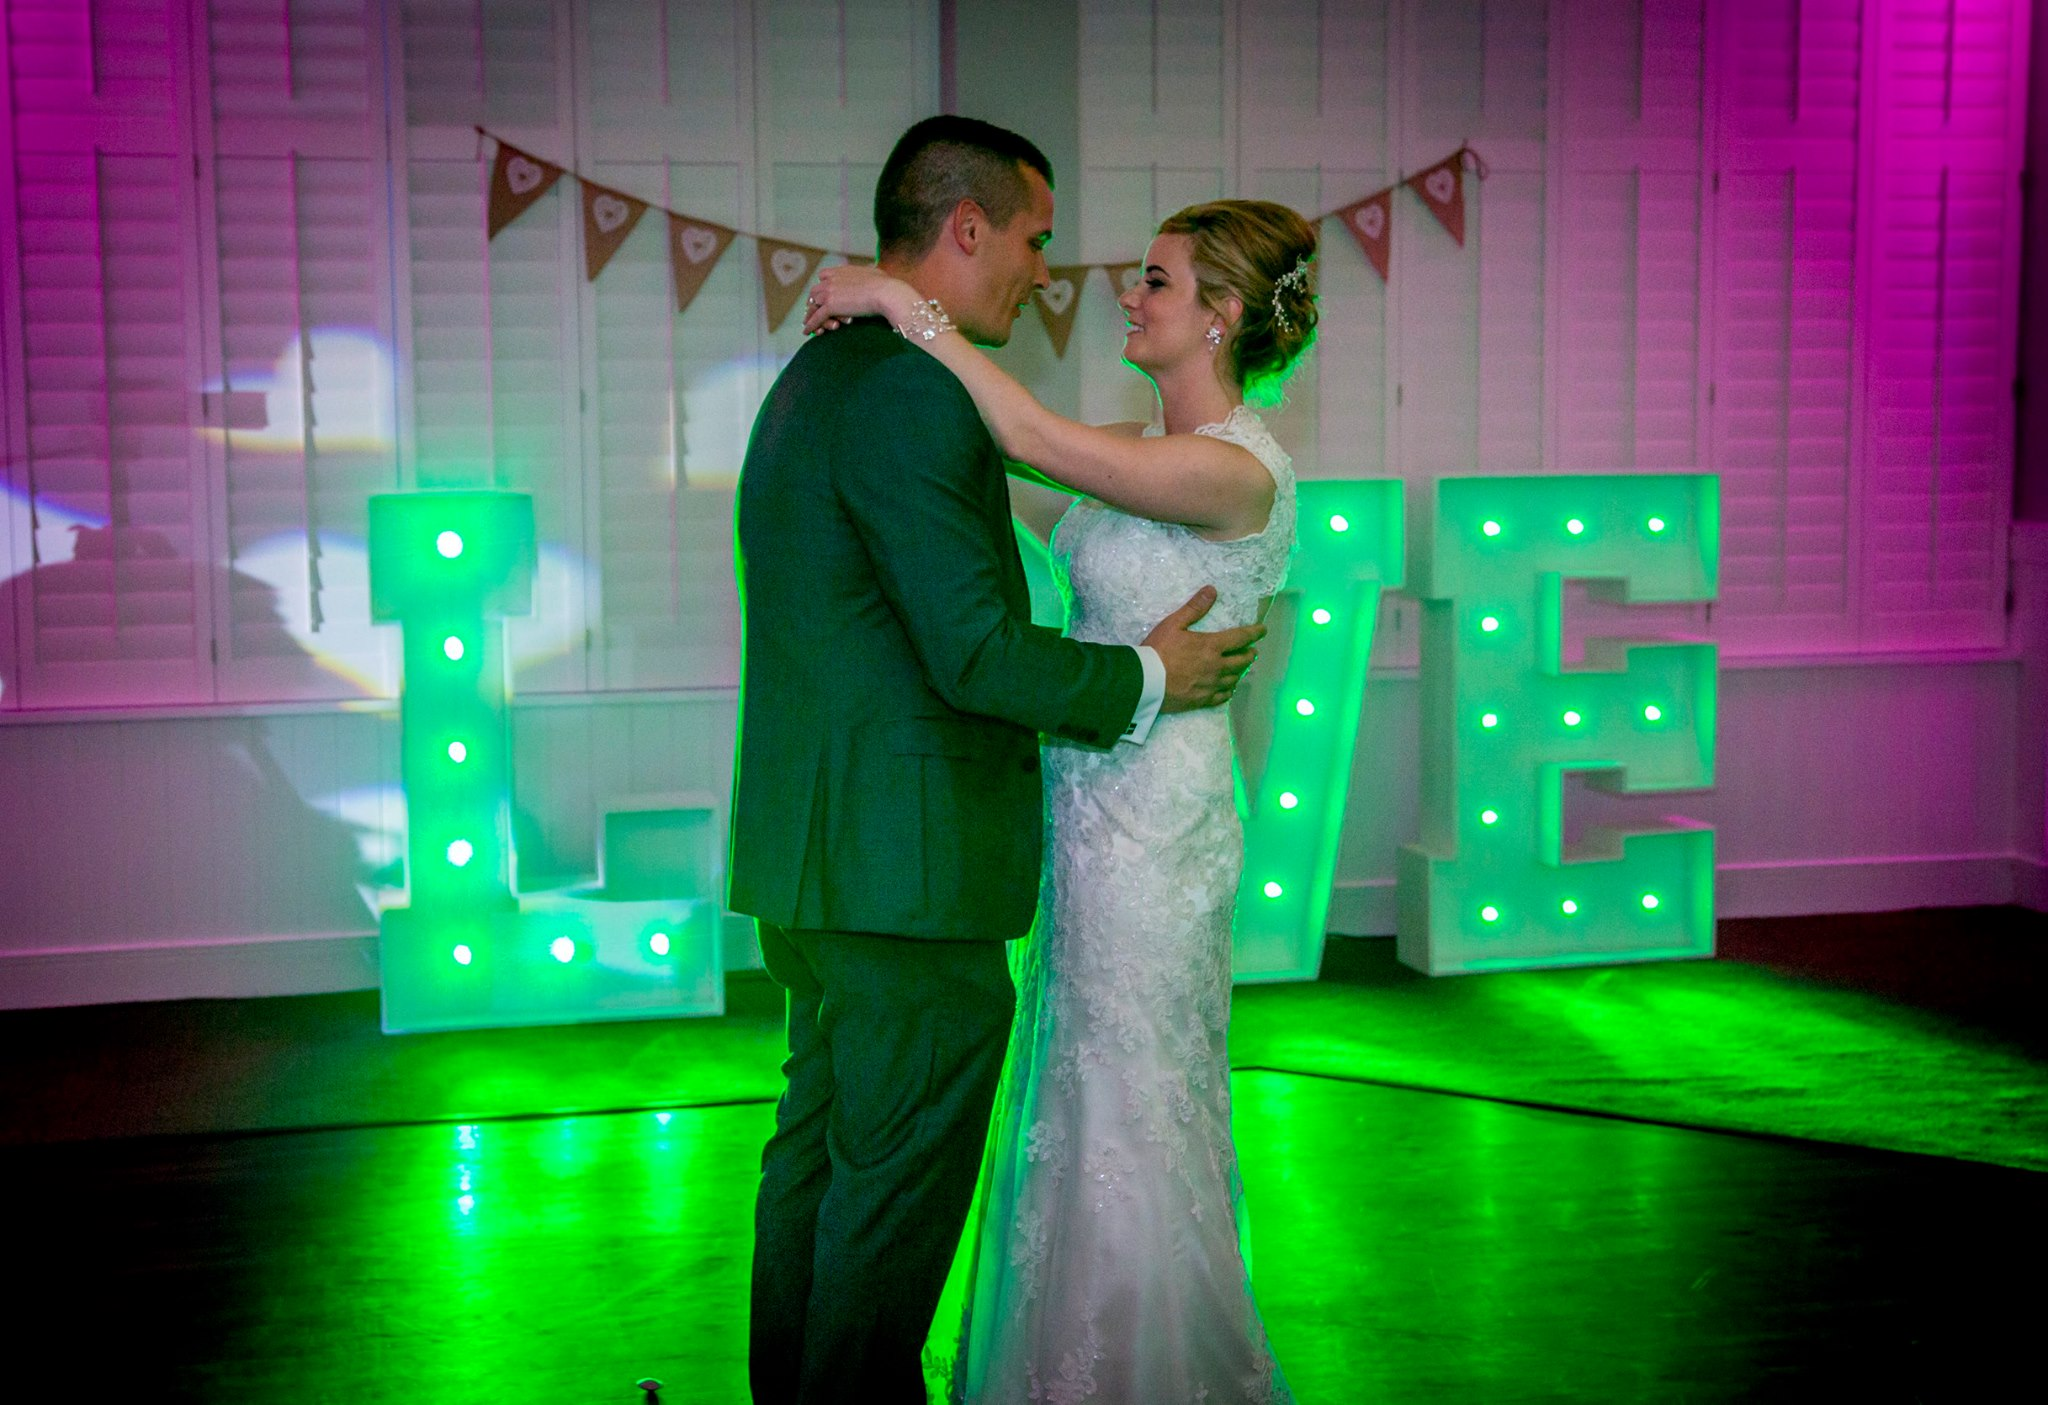 cornwall wedding disco dj photographer 17